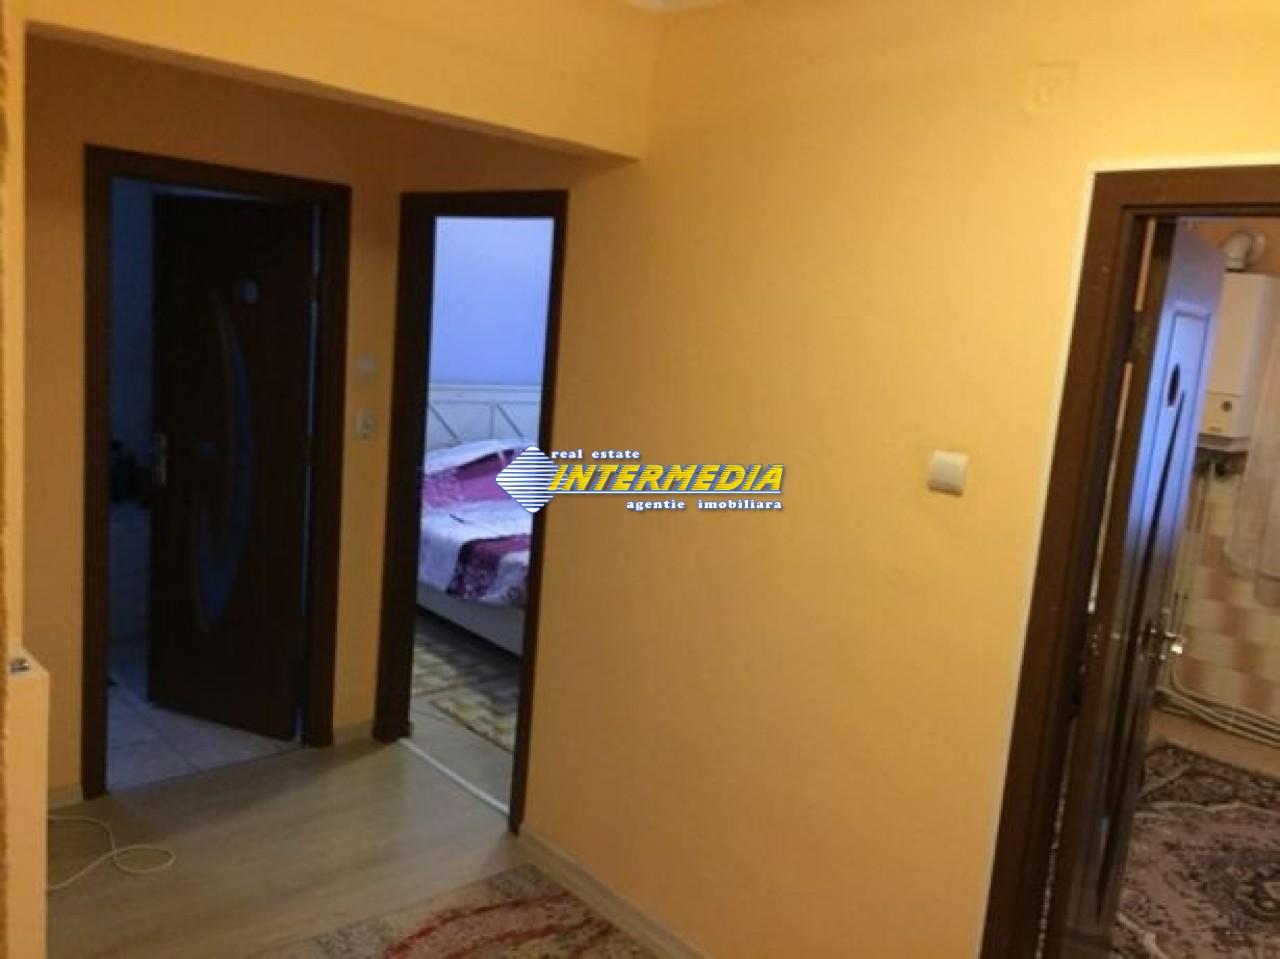 212668055_2_644x461_vand-apartament-zona-cetate-fotografii.jpg